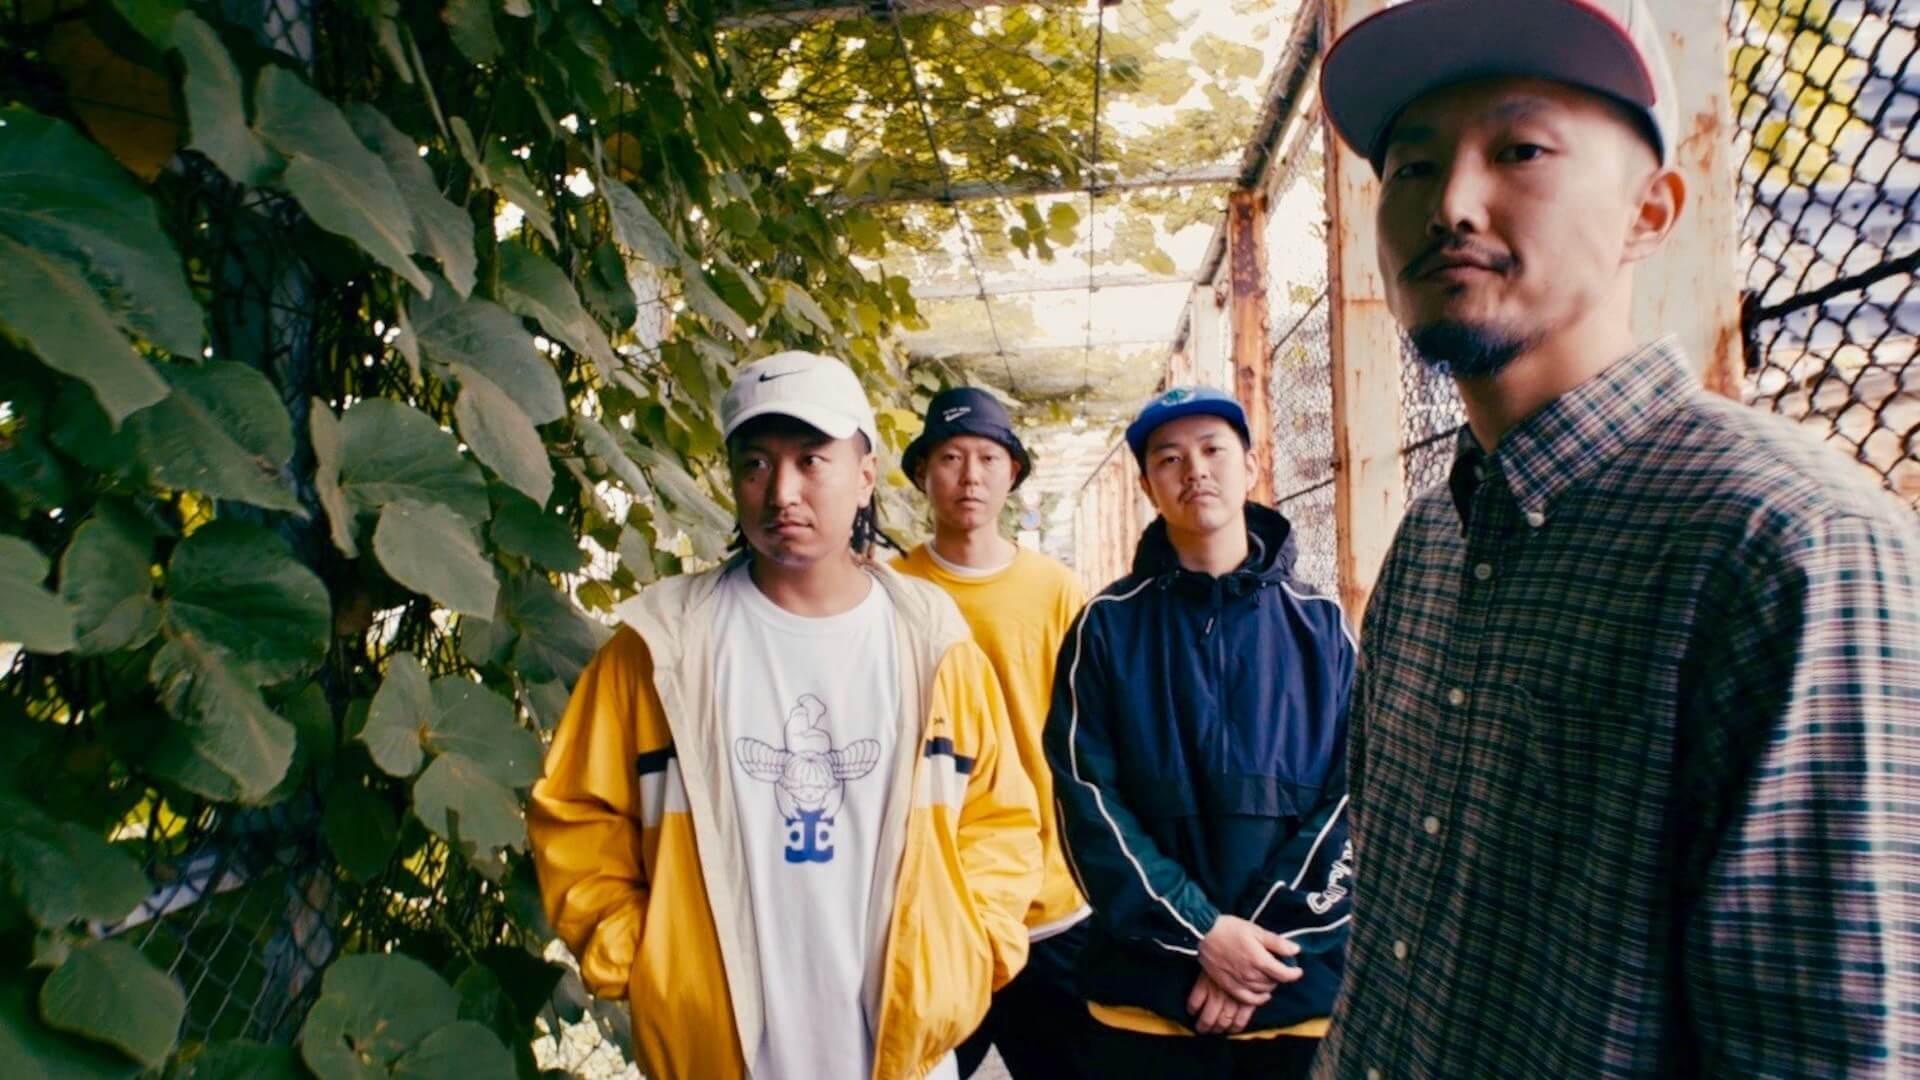 JUMANJI、1stアルバム「DAWN」を11月にリリース 仙人掌、GAMEBOYS&VOLOJZA、HIT、jjj、FEBBらが参加 music191006-jumanji